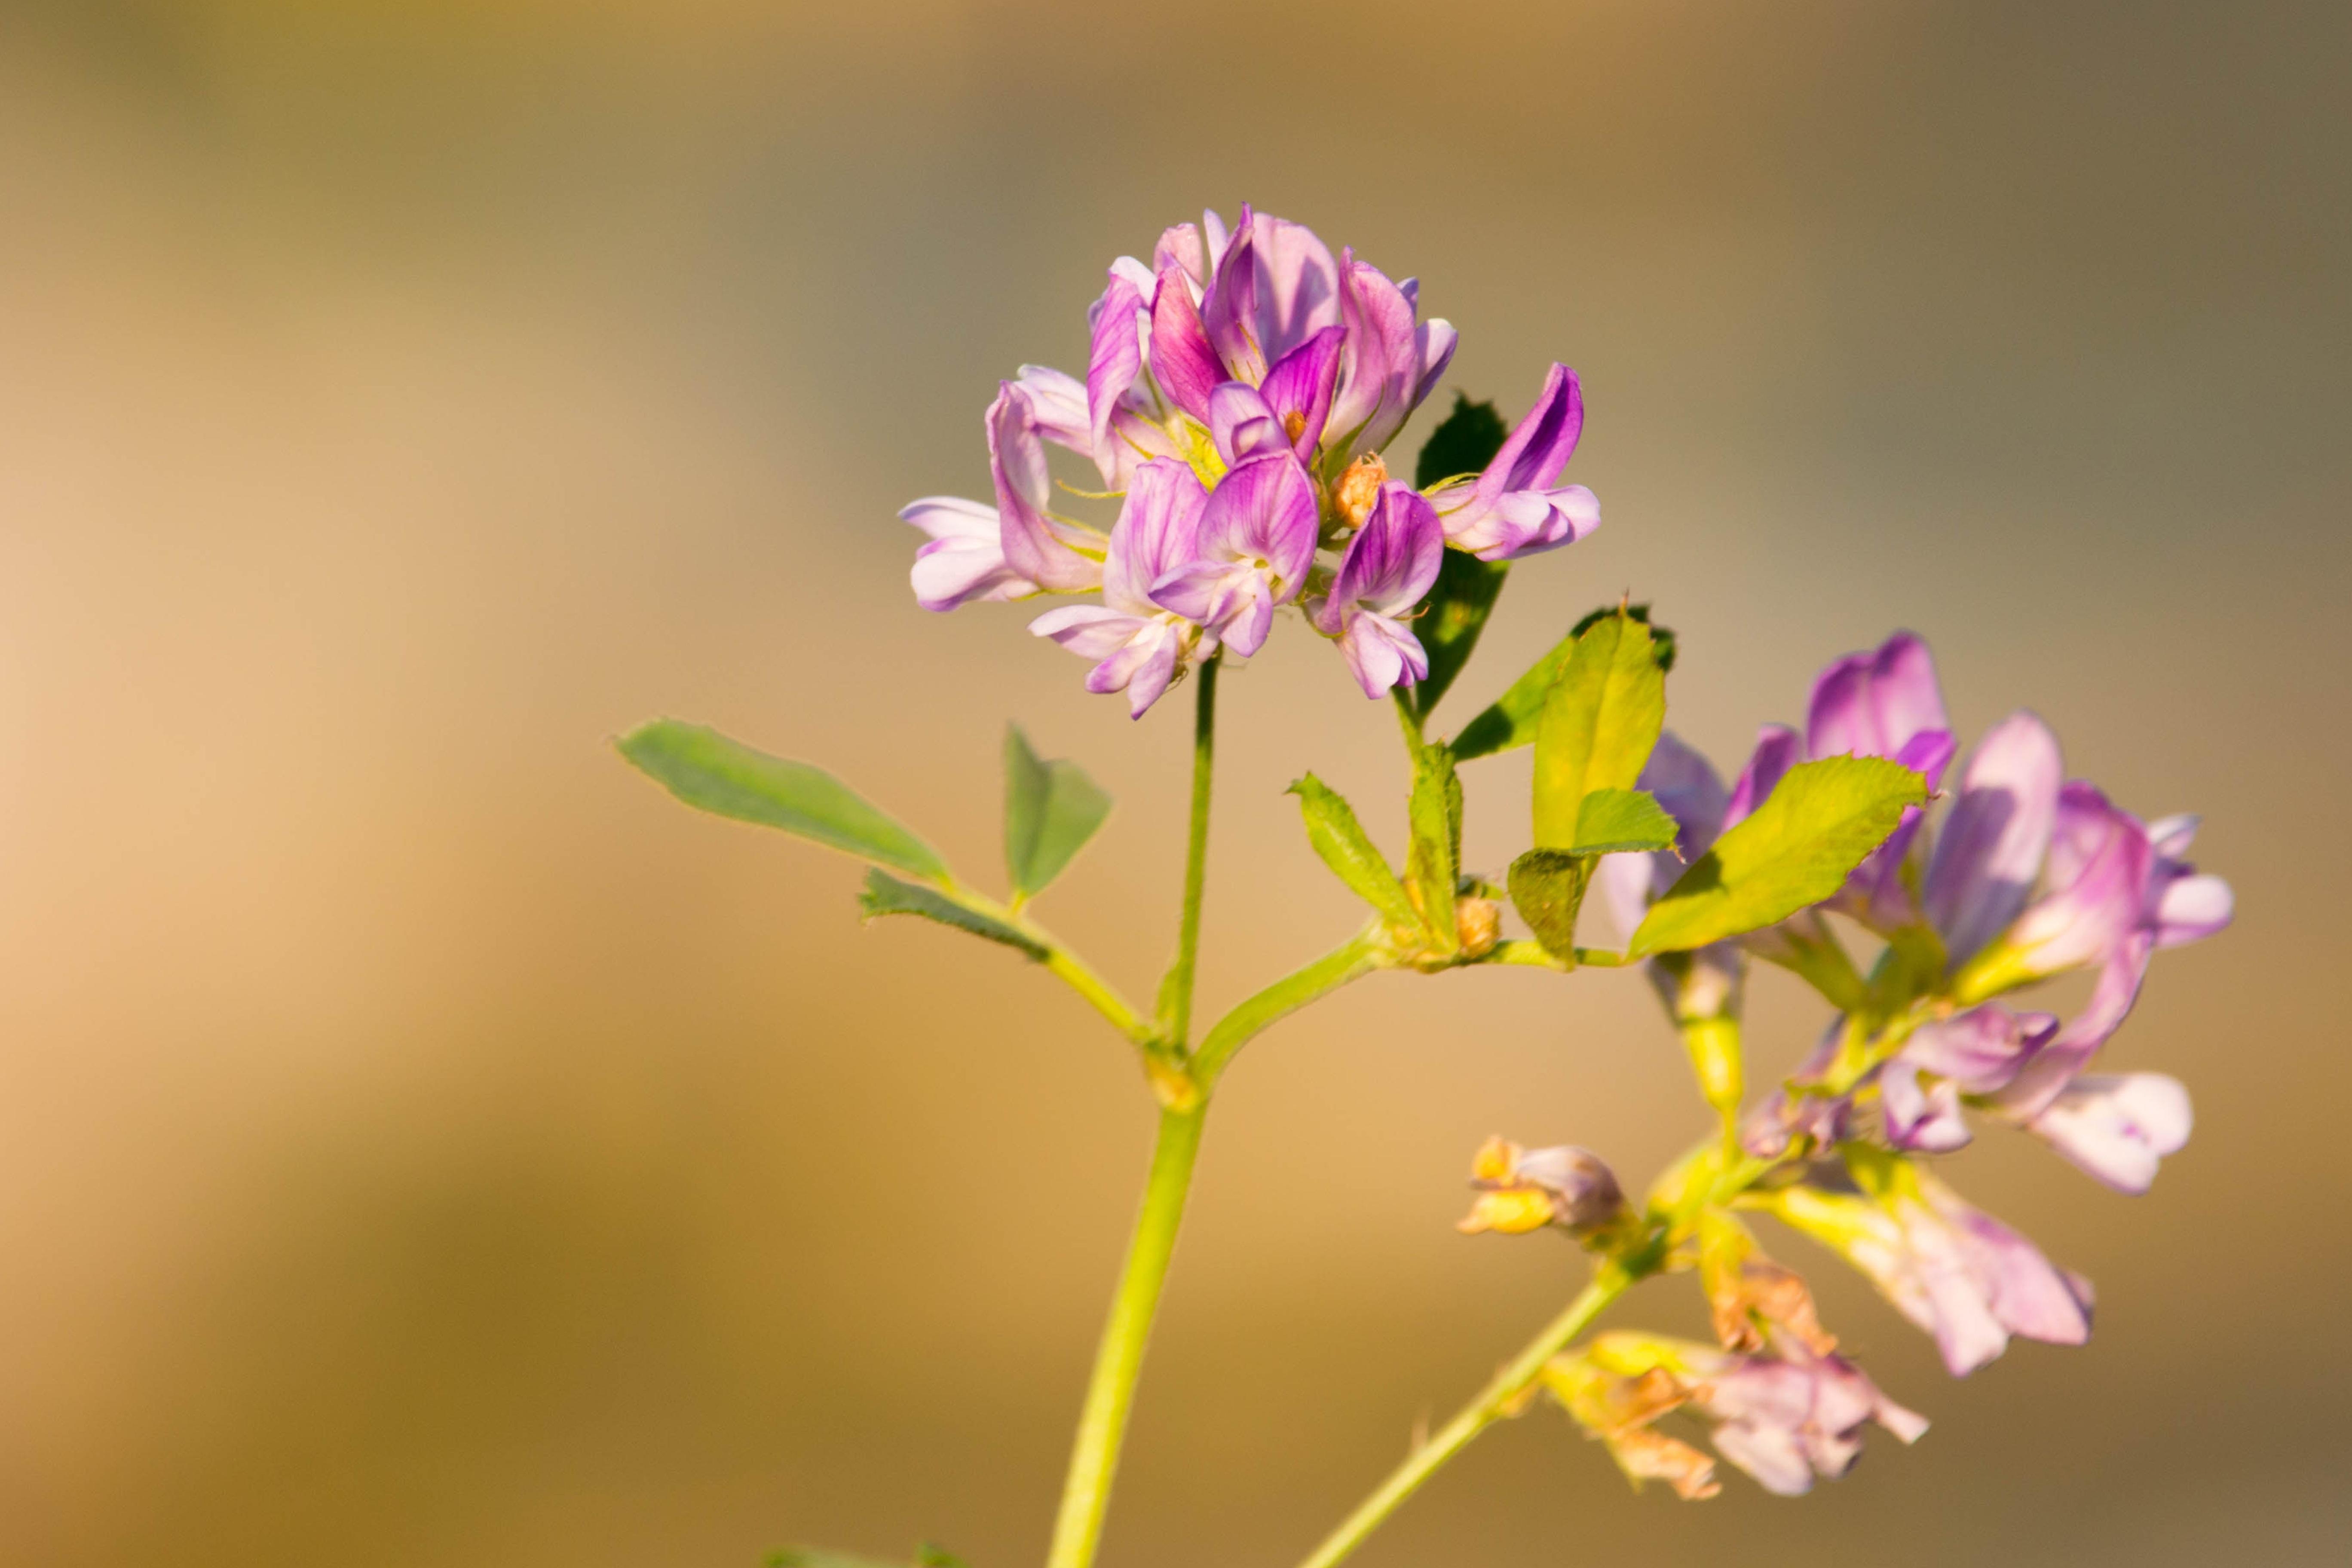 Yellow Pink Flora Wild Flower Wildflower Close Up Purple Nectar Filigree Macro Photography Flowering Plant Small